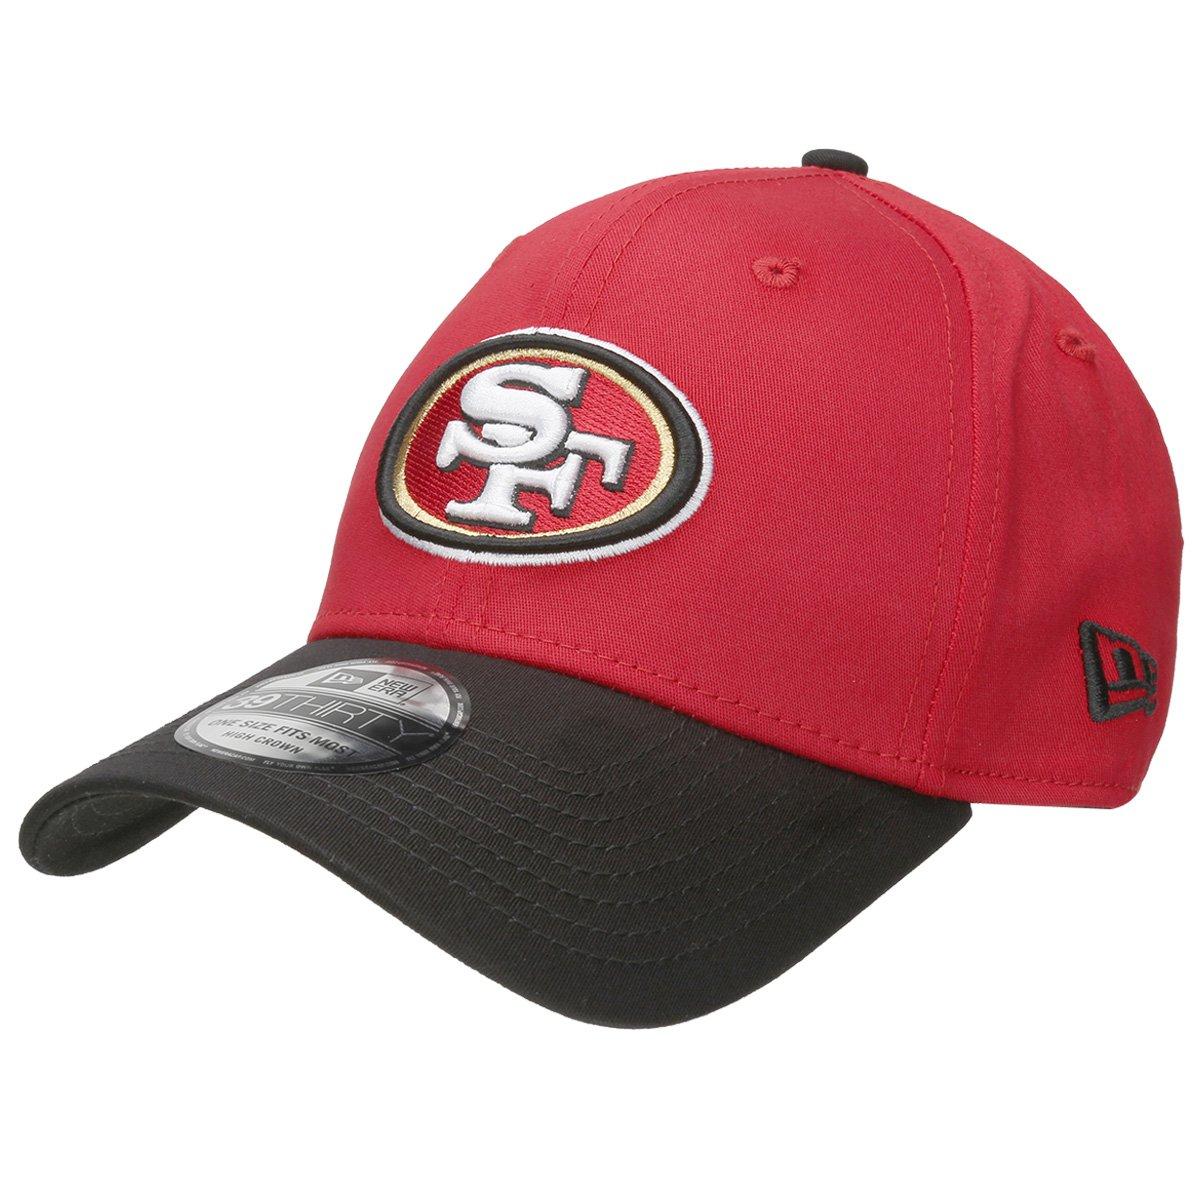 Boné New Era NFL 3930 Hc Basic San Francisco 49Ers - Compre Agora ... a923d033a1c